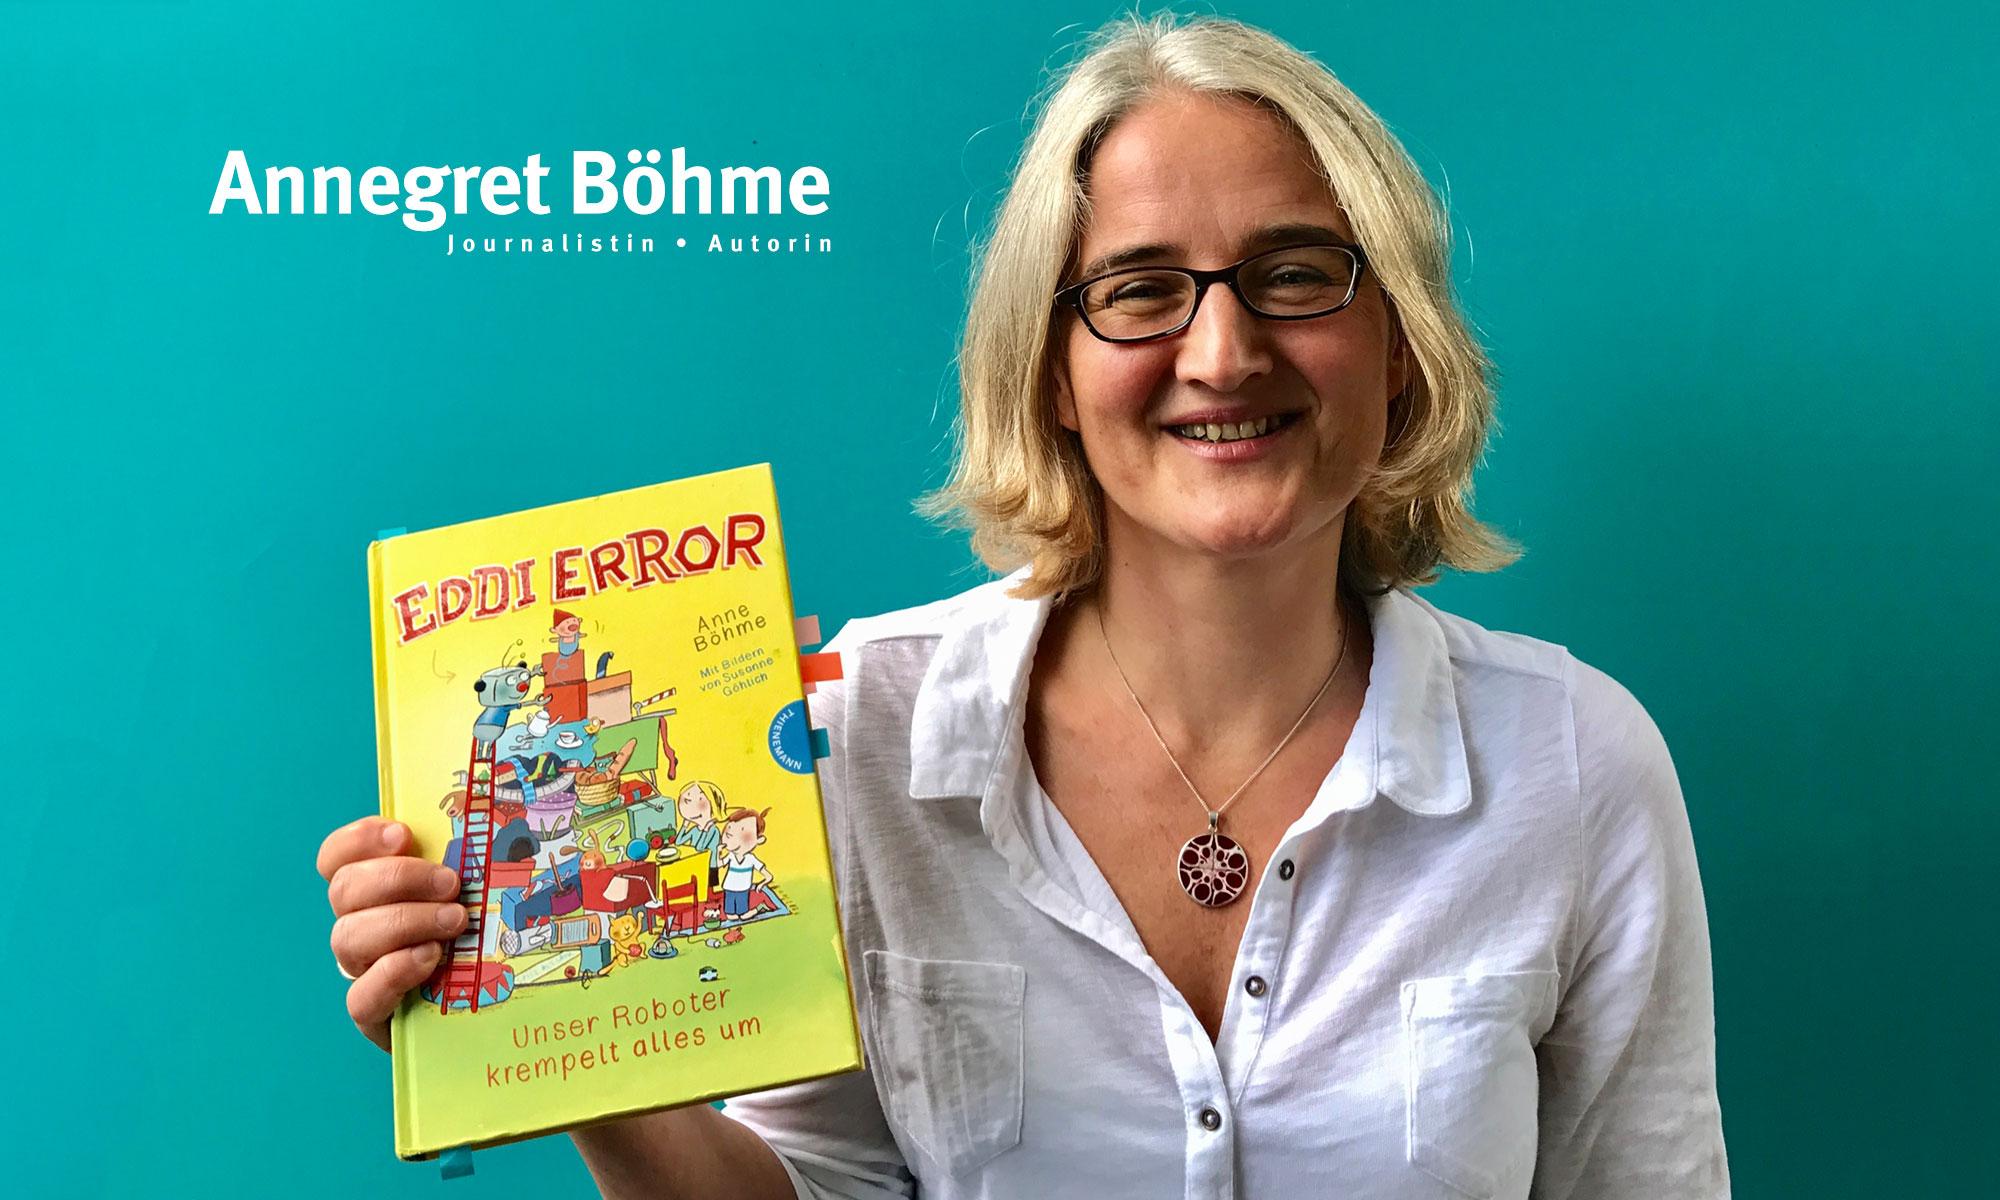 Annegret Böhme